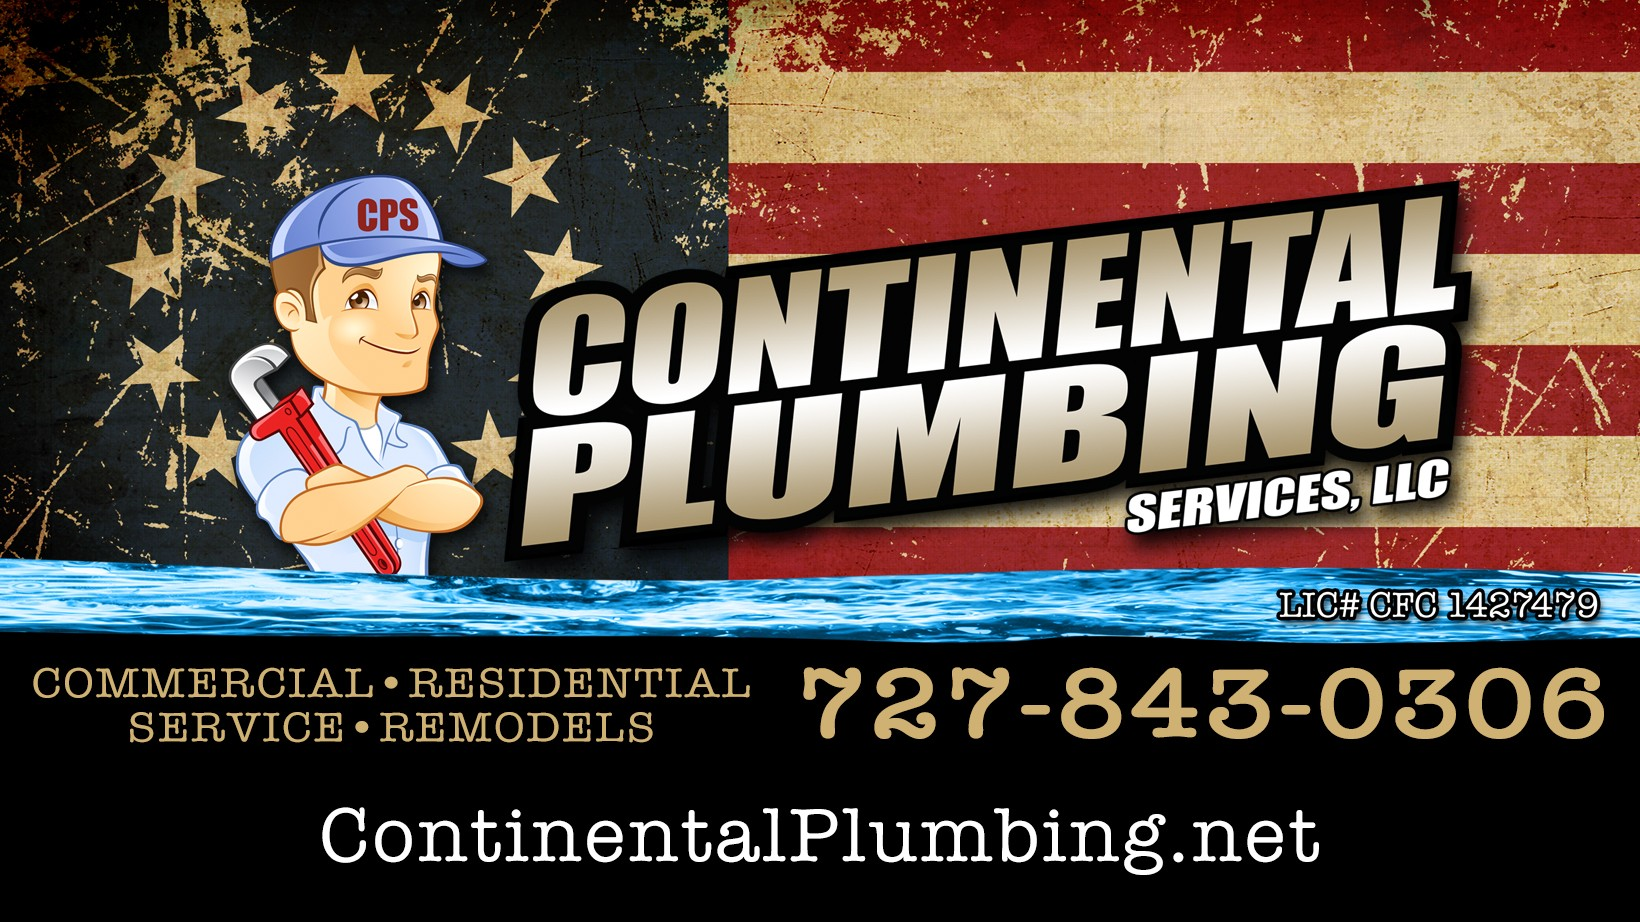 Continental Plumbing Services Llc Linkedin